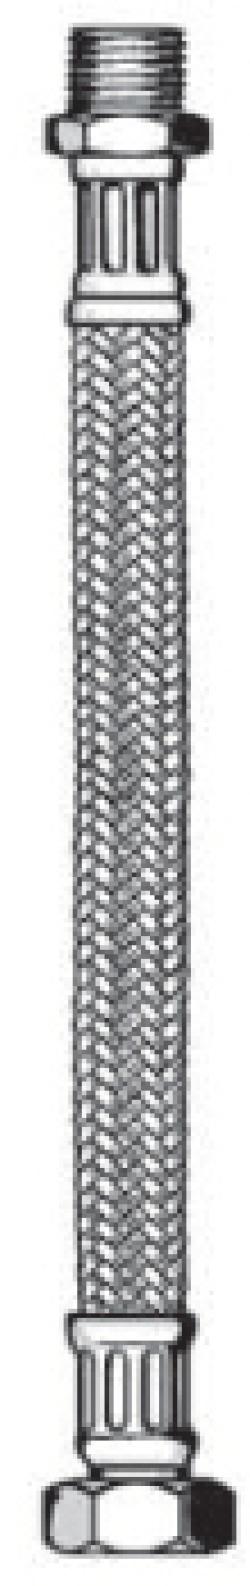 МЕ 5625.1127.30 Meiflex Dn18, 3/4 BPx3/4HP, 300mm